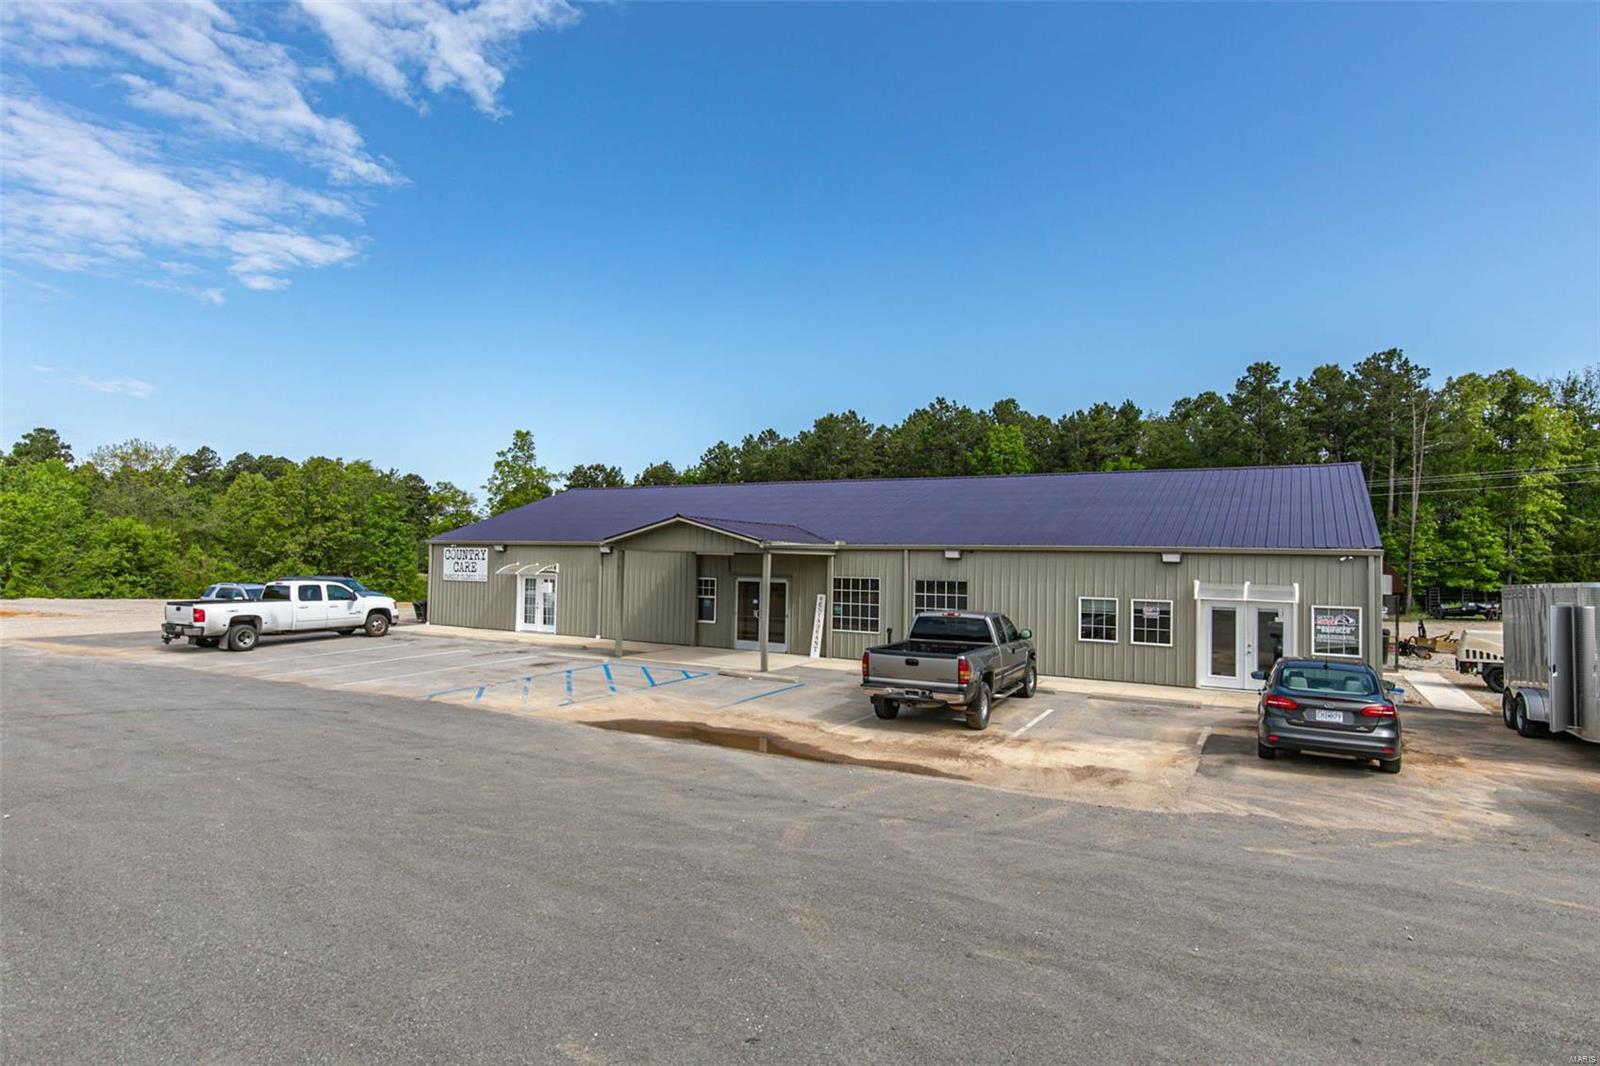 32365 Hwy 60 Property Photo - Ellsinore, MO real estate listing